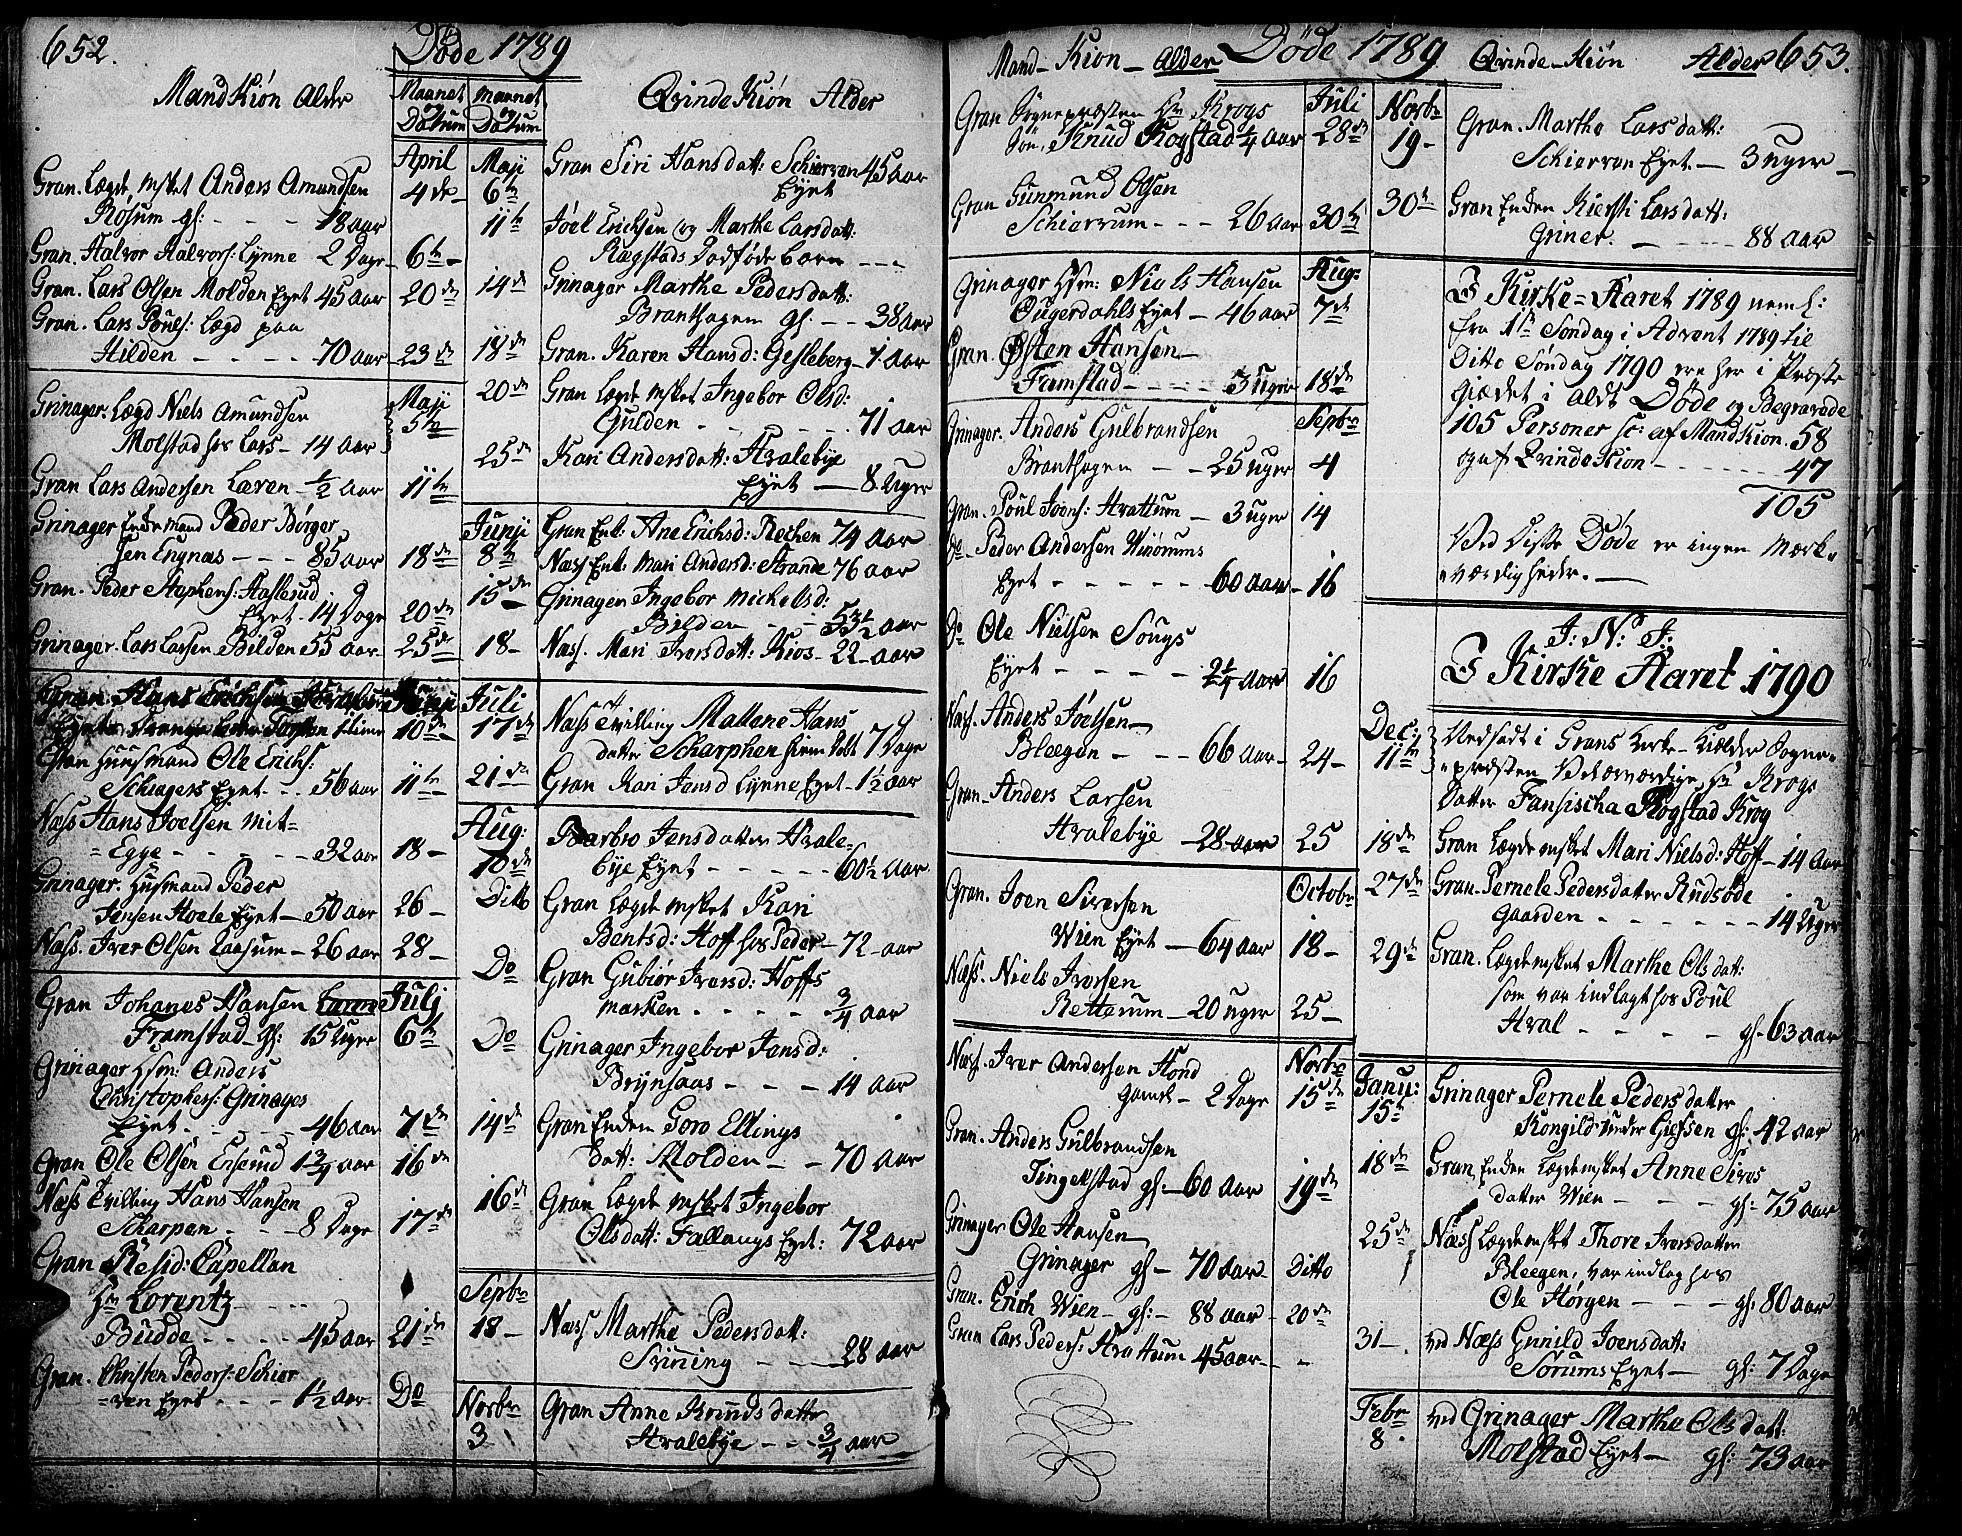 SAH, Gran prestekontor, Ministerialbok nr. 6, 1787-1824, s. 652-653